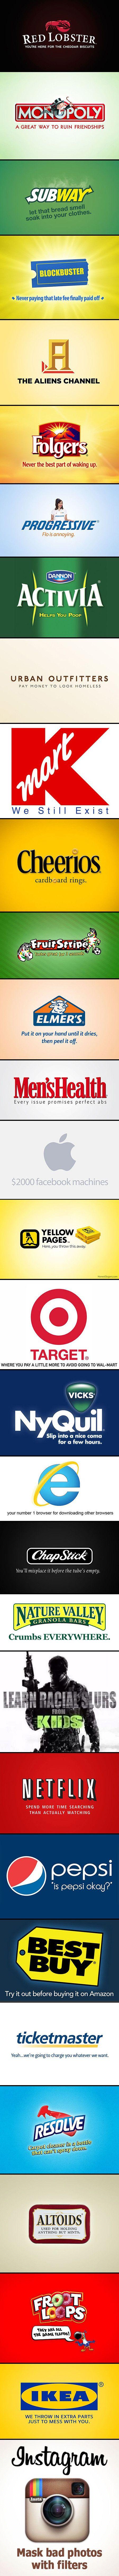 30 Funny and Honest Company Logos, Slogans